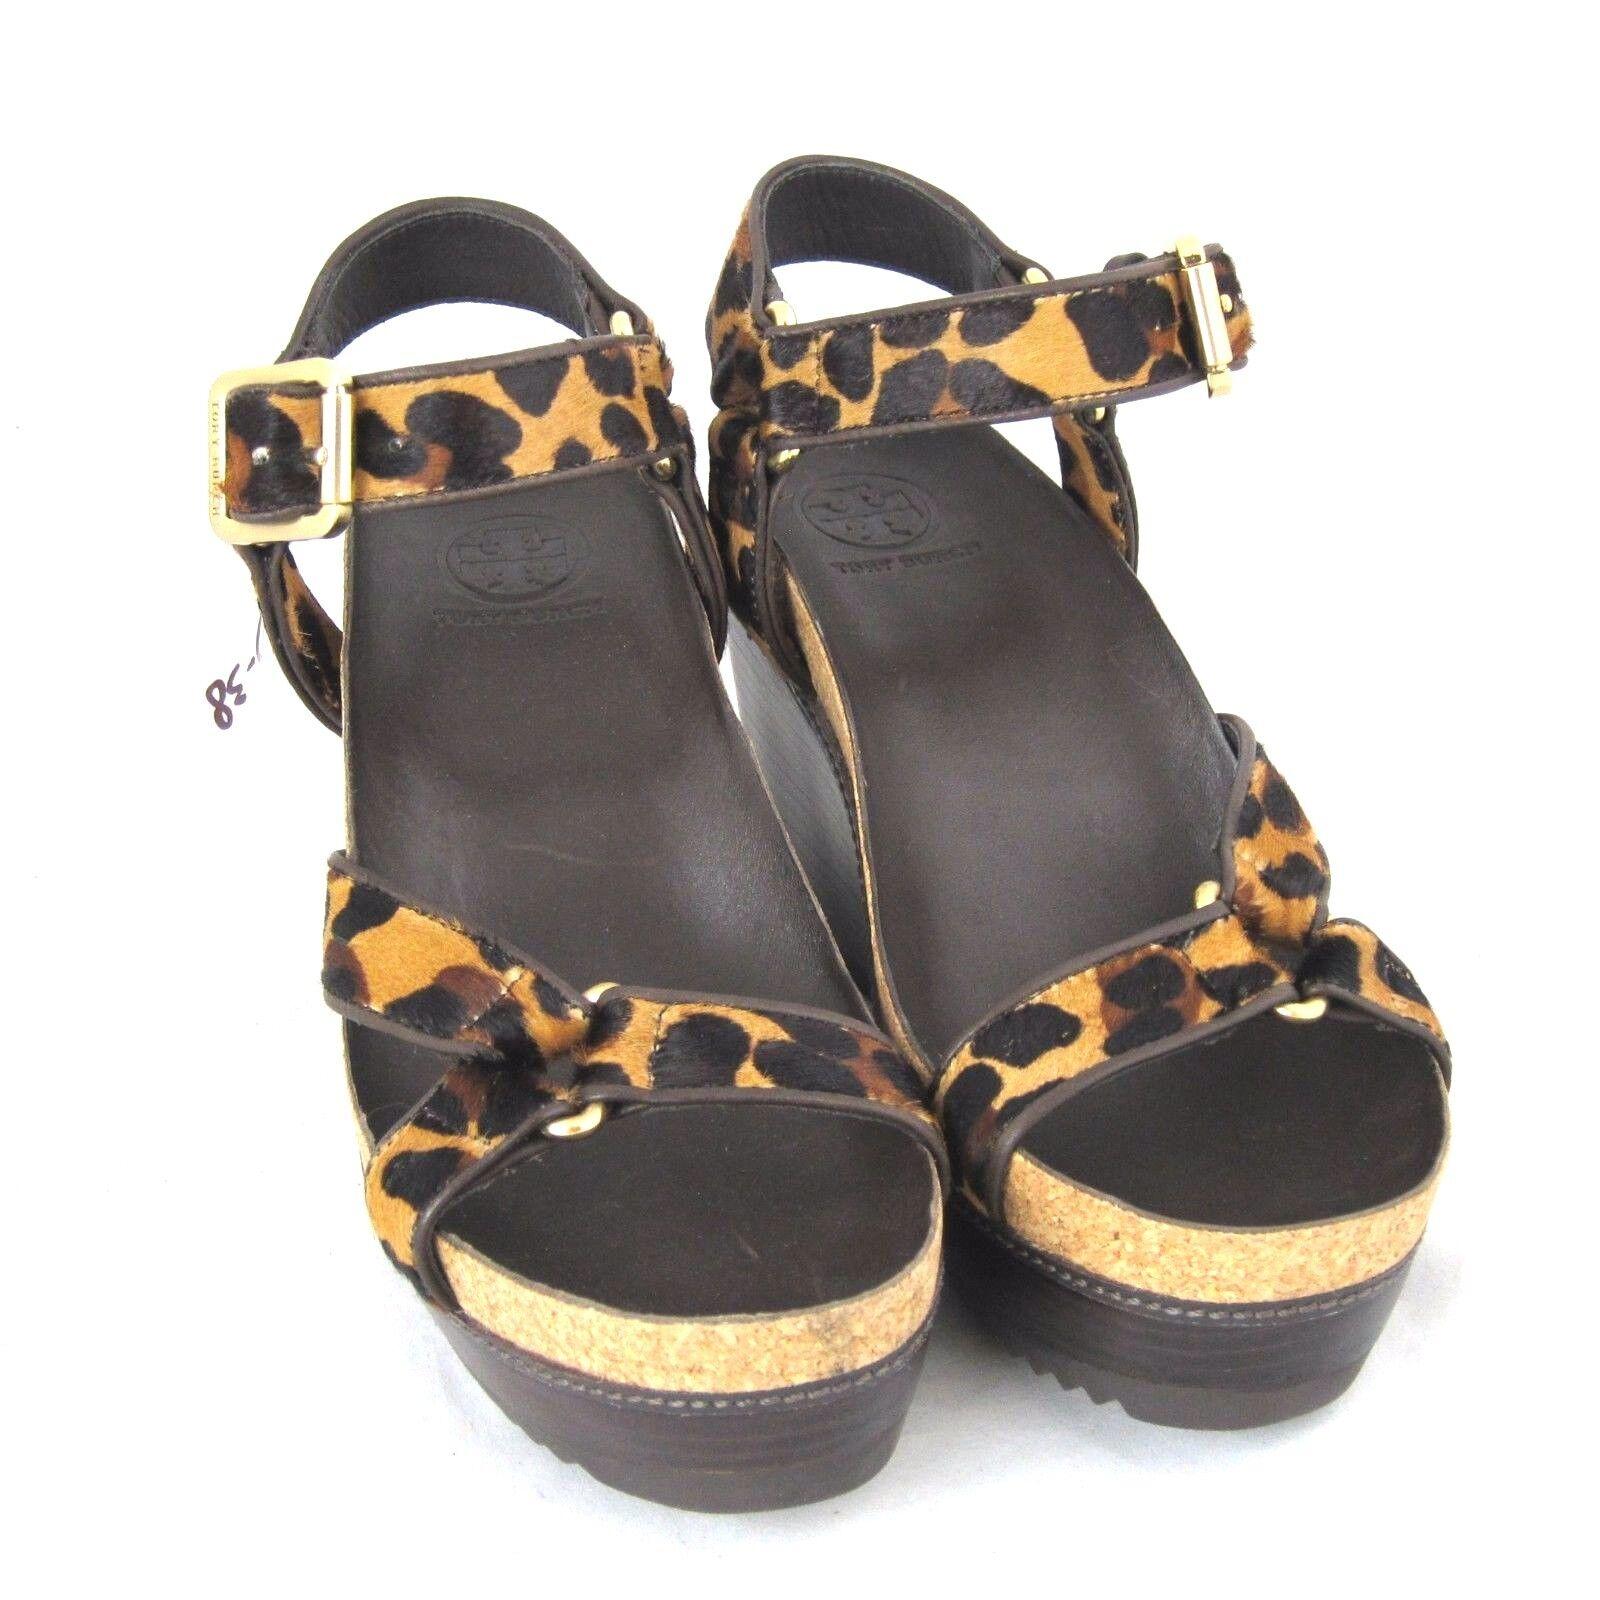 K-TB4082 Nuevo Tory Burch Loepardo Sandalias de Cuero Chanclas Tanga Zapatos